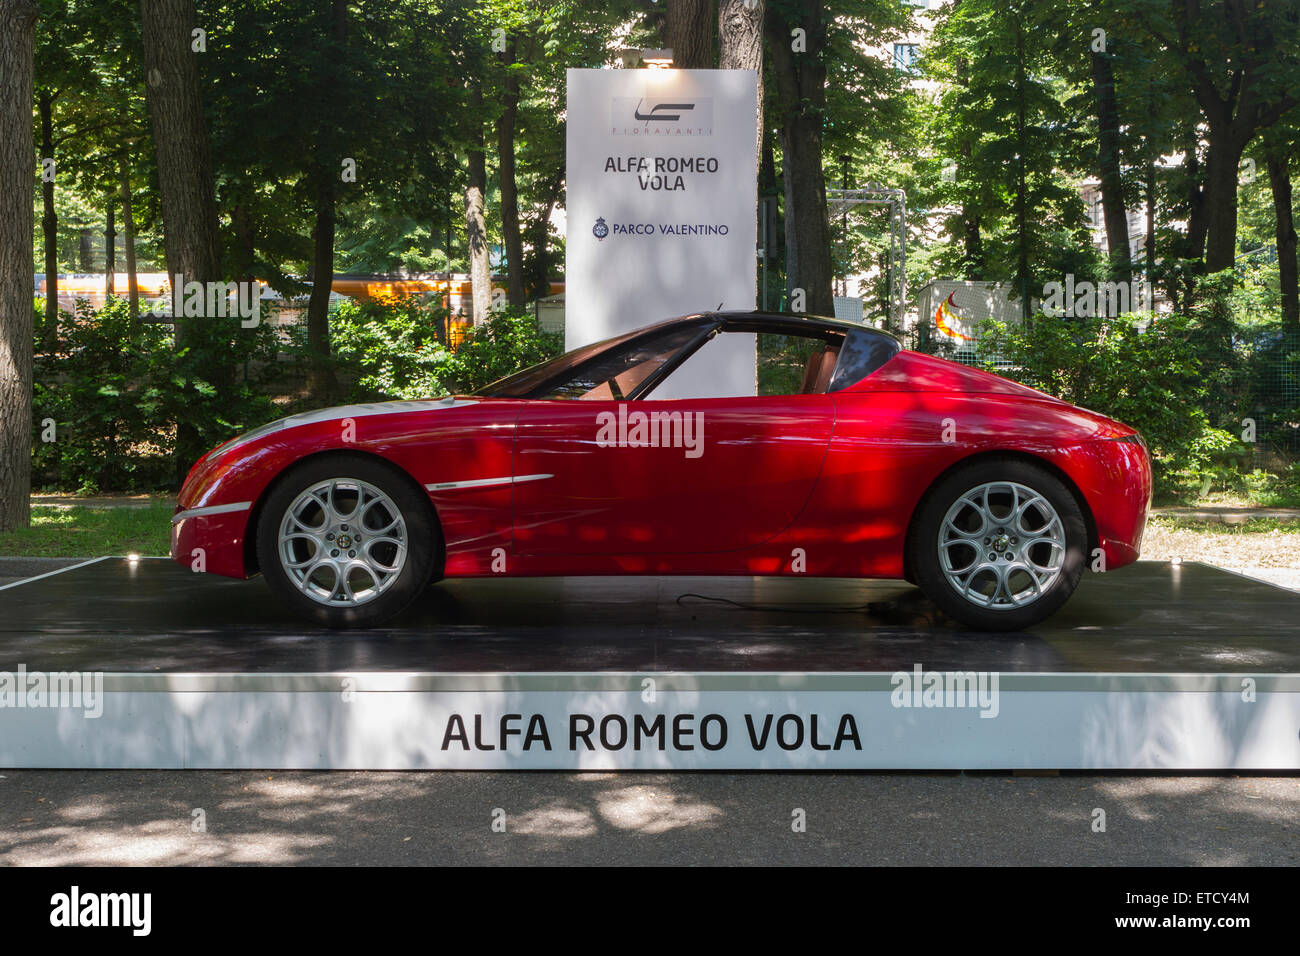 Turin, Italy. 11th June, 2015. Prototype car Alfa Romeo Vola by Fioravanti. Parco Valentino car show hosted 93 cars - Stock Image